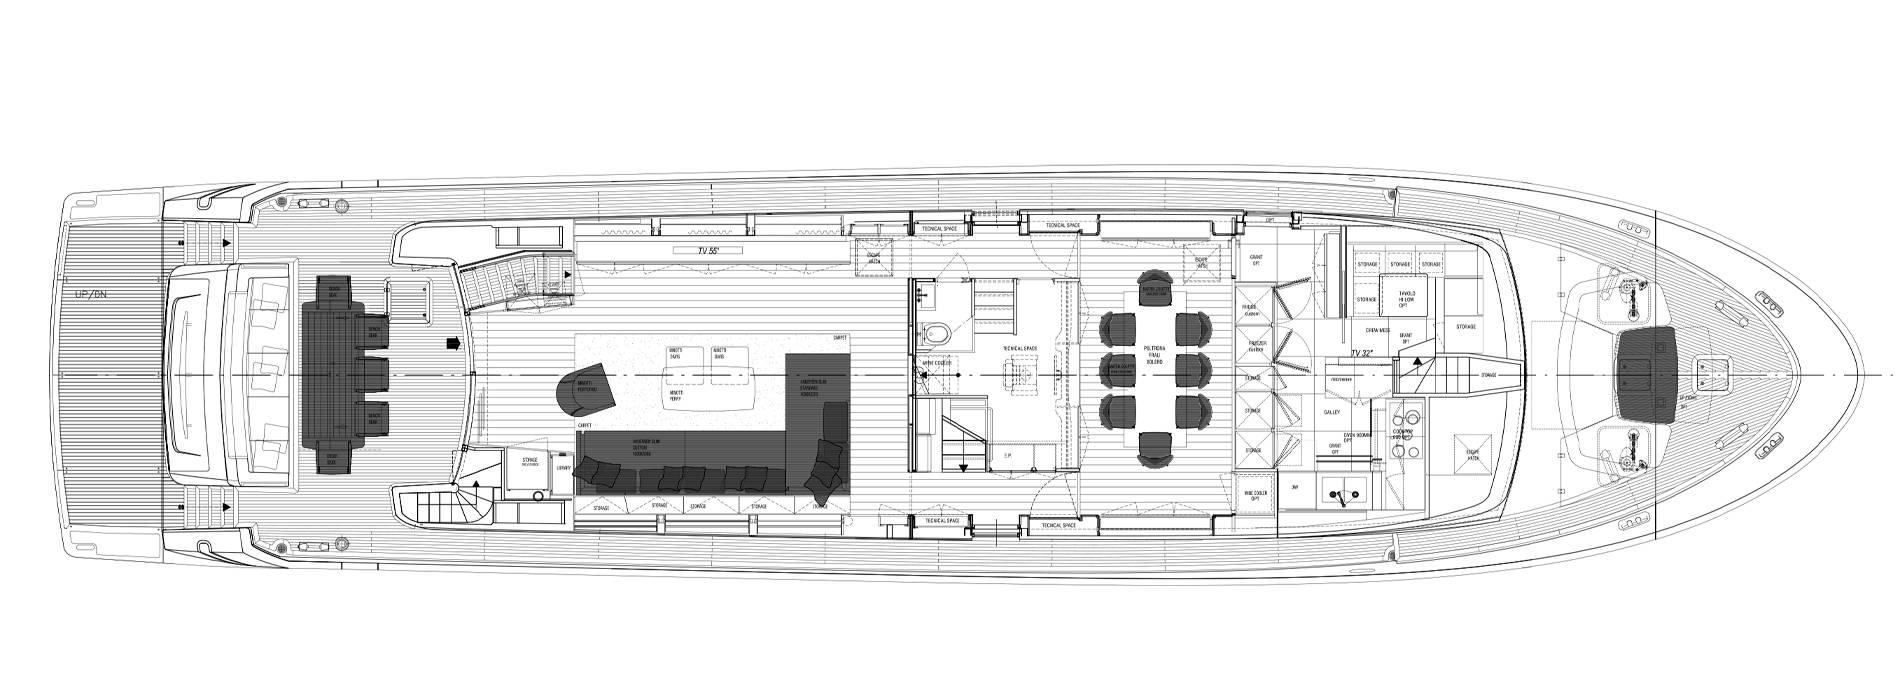 Sanlorenzo Yachts SL96-684 Главная палуба